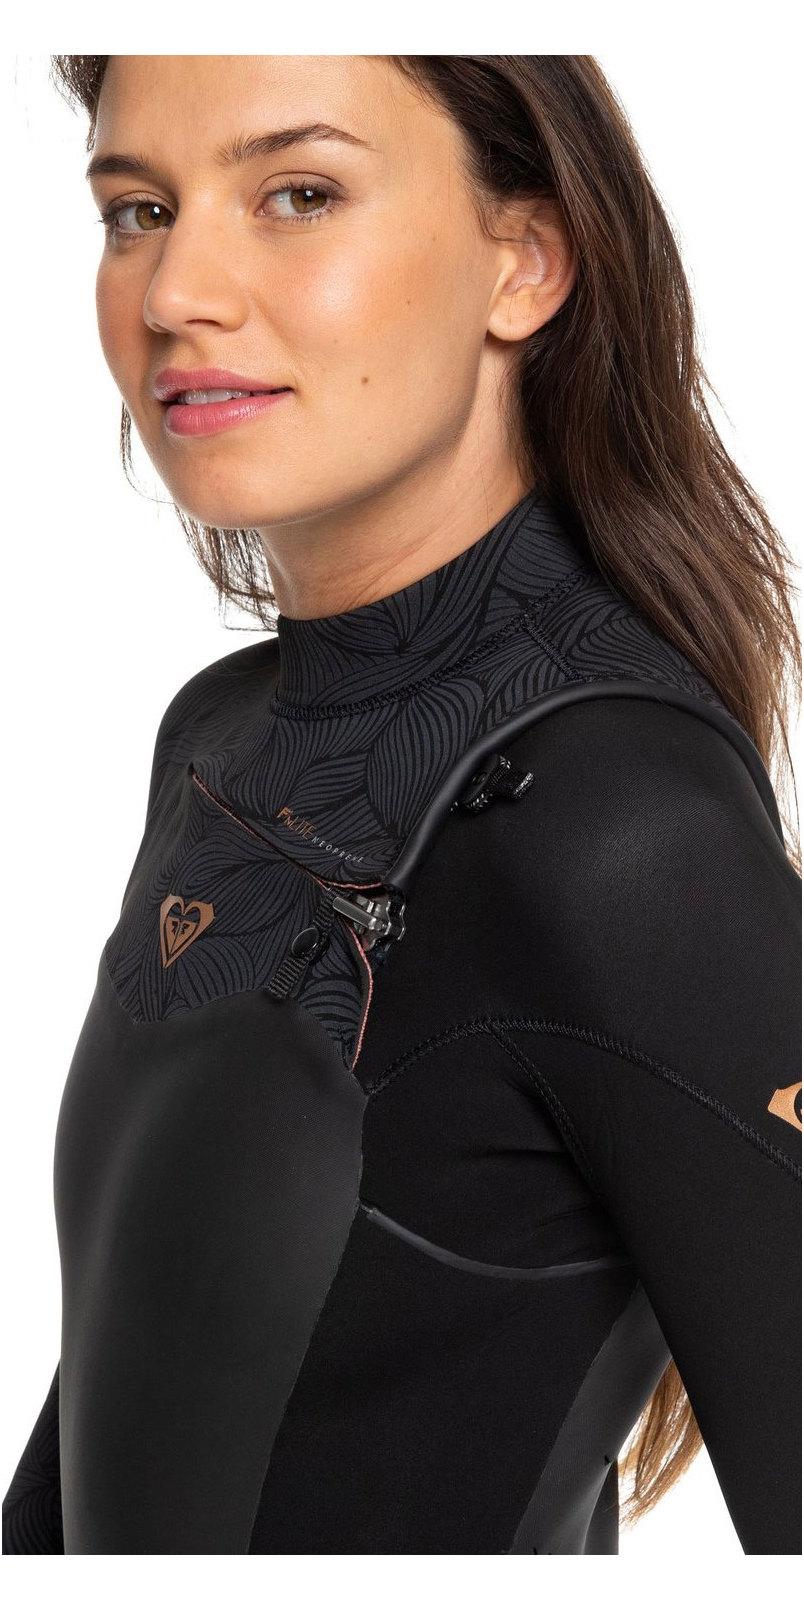 2019 Traje De Neopreno Con Chest Zip Mujer Roxy Performance 4/3mm Negro Erjw103032